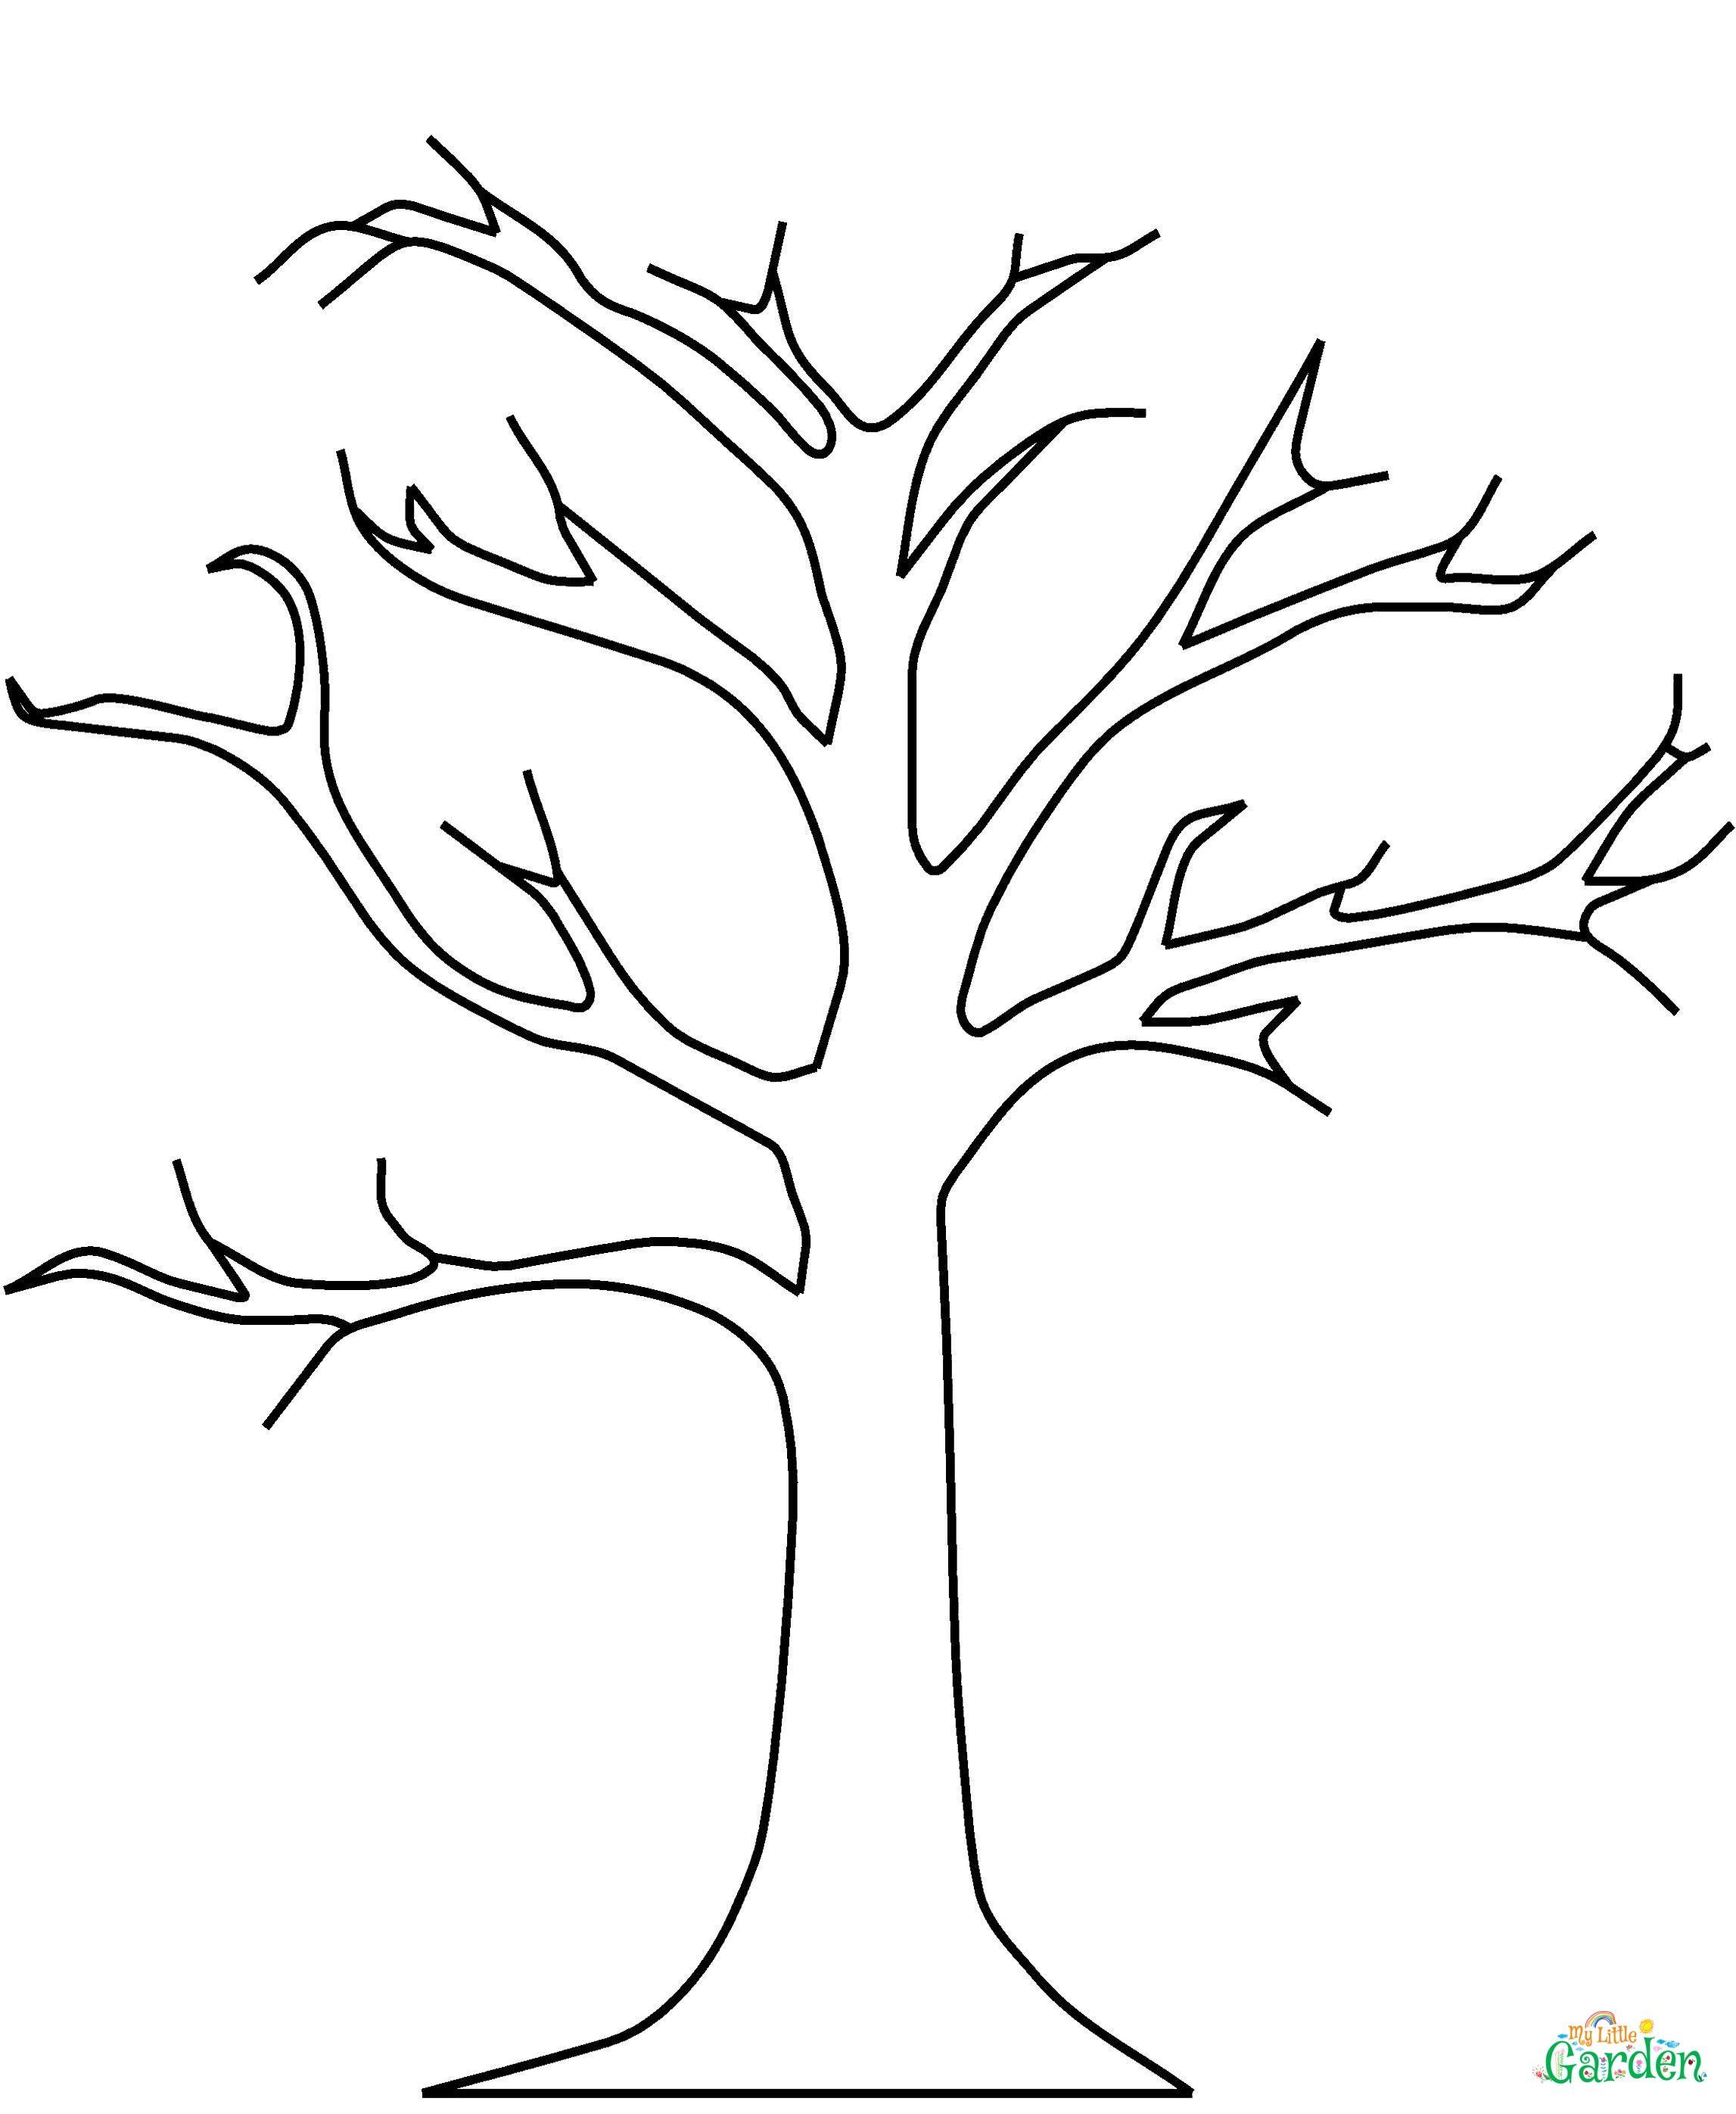 malvorlage baum kostenlos 01 art simple drawings mit